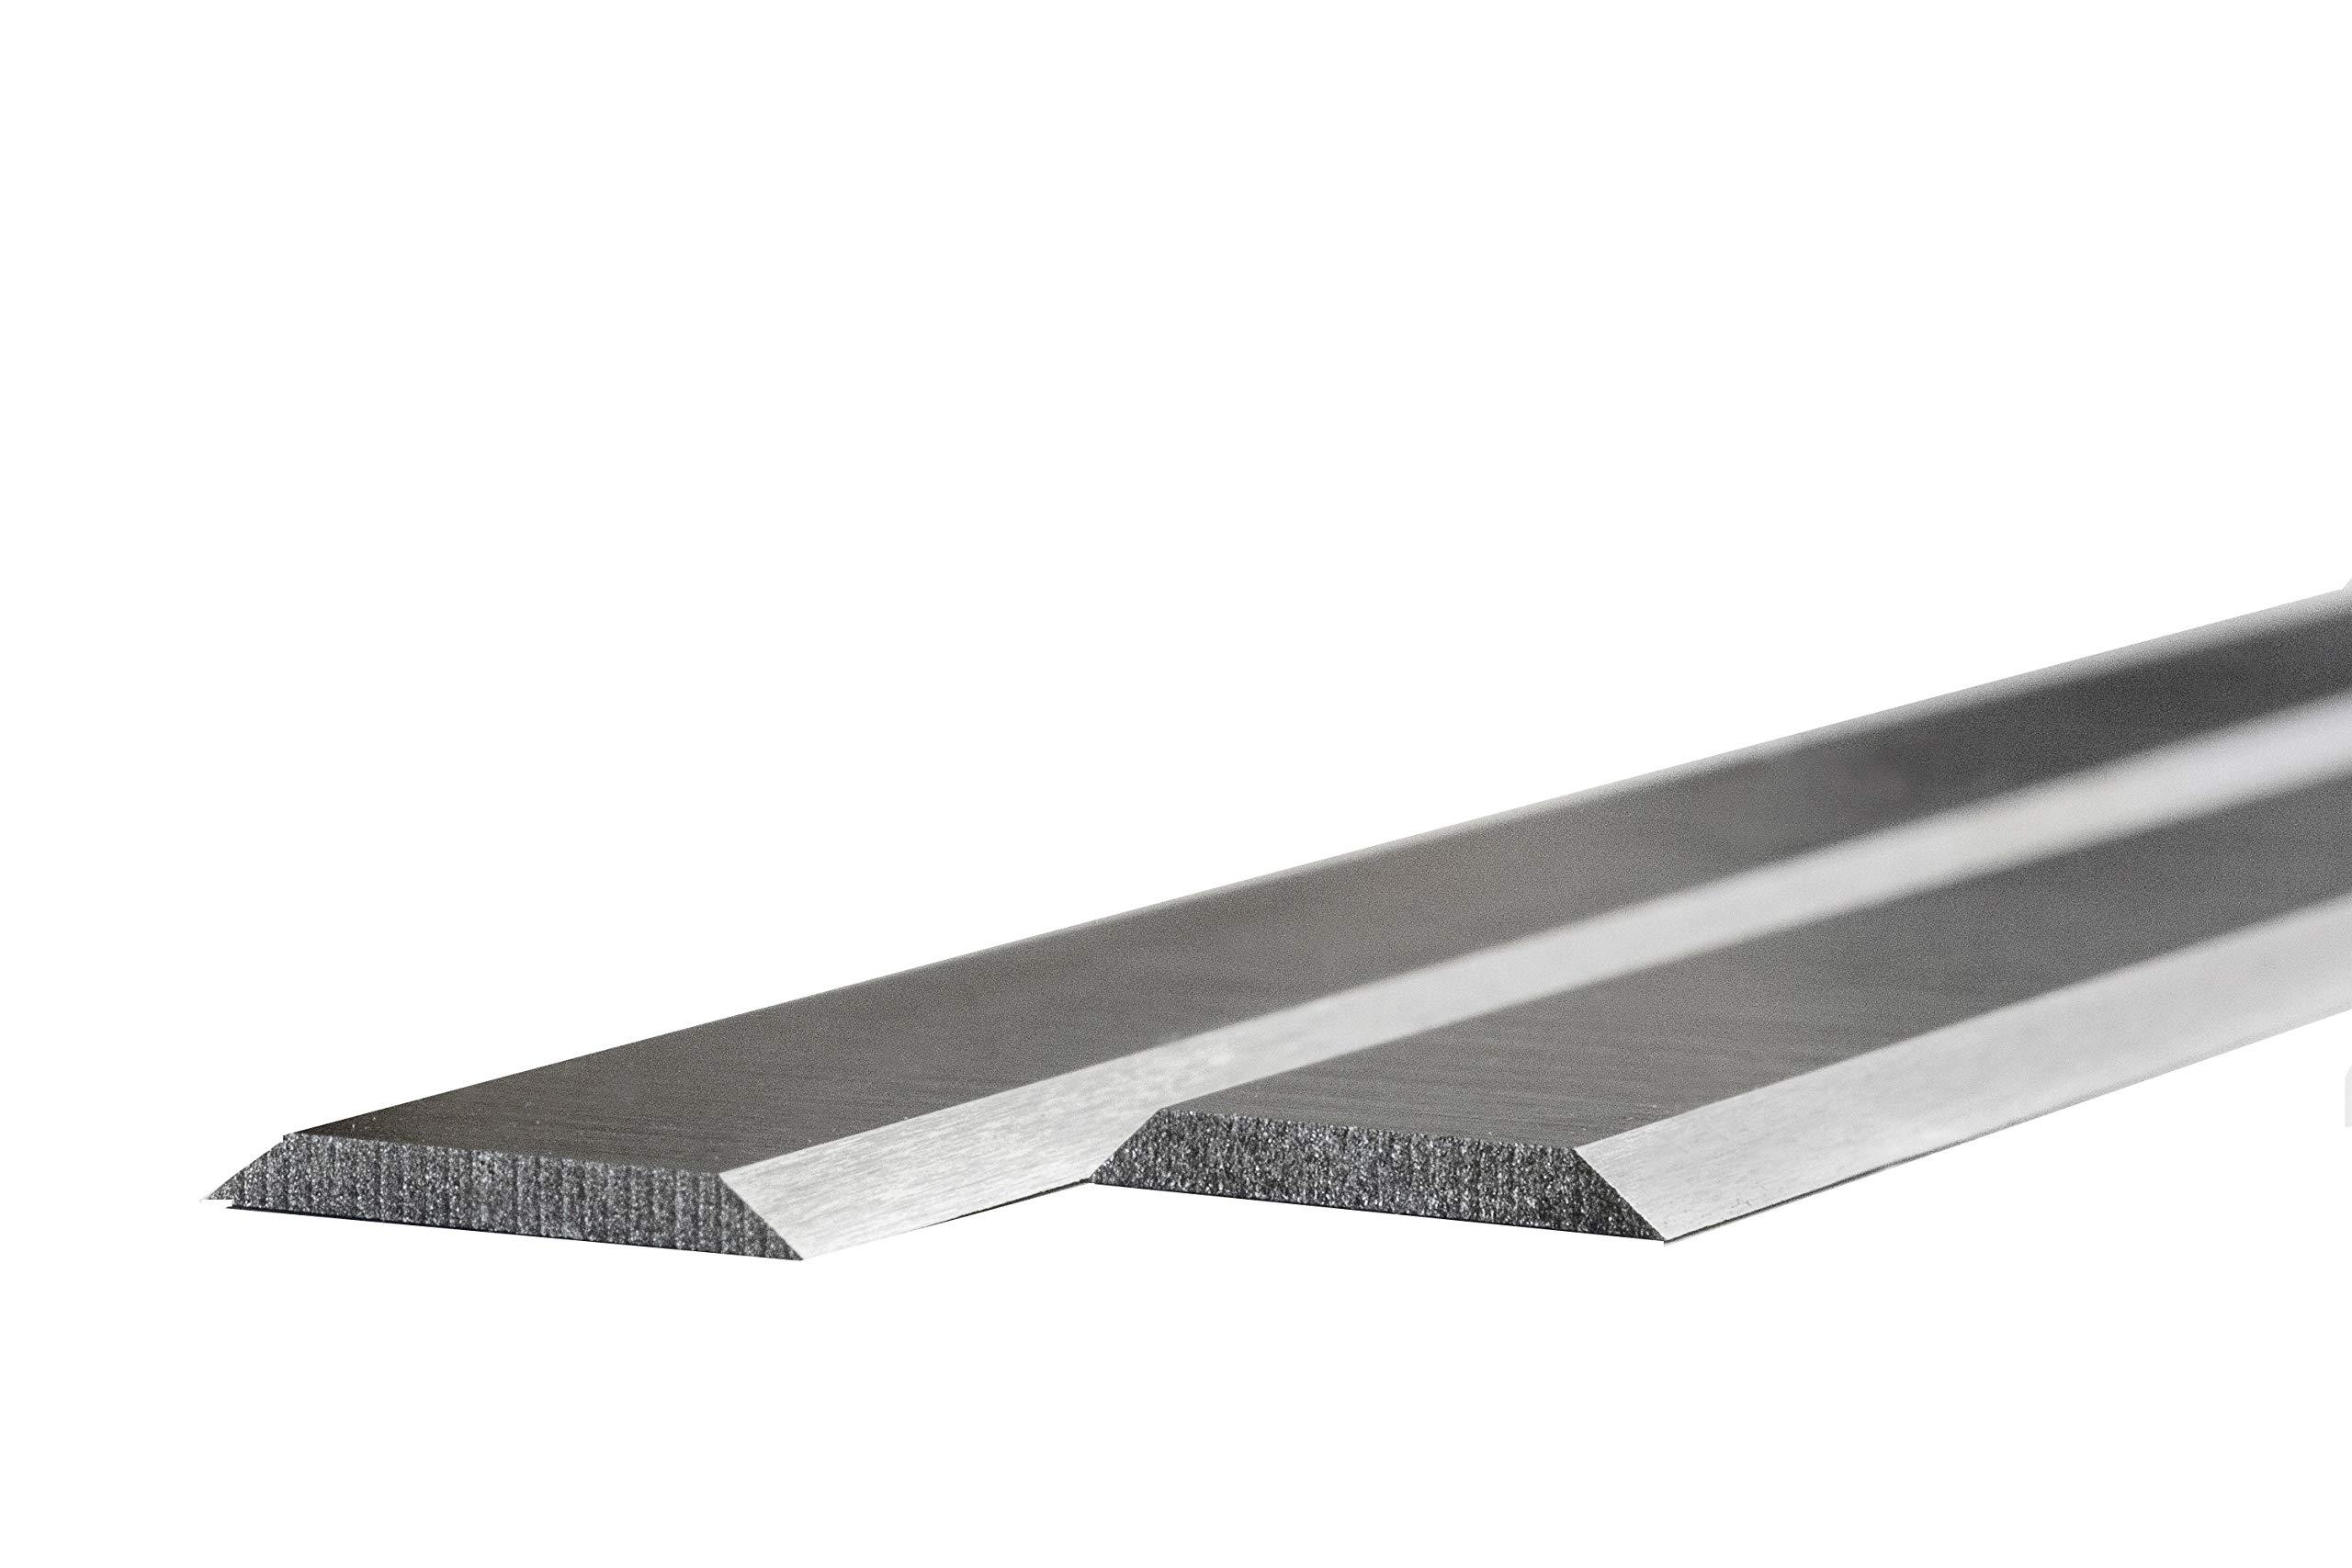 Bosch TCT Carbide Planer Blades for Makita Box of 2-3.1//4 Black /& Decker 82mm DeWalt and Elu planers Quick DELIVERY /…